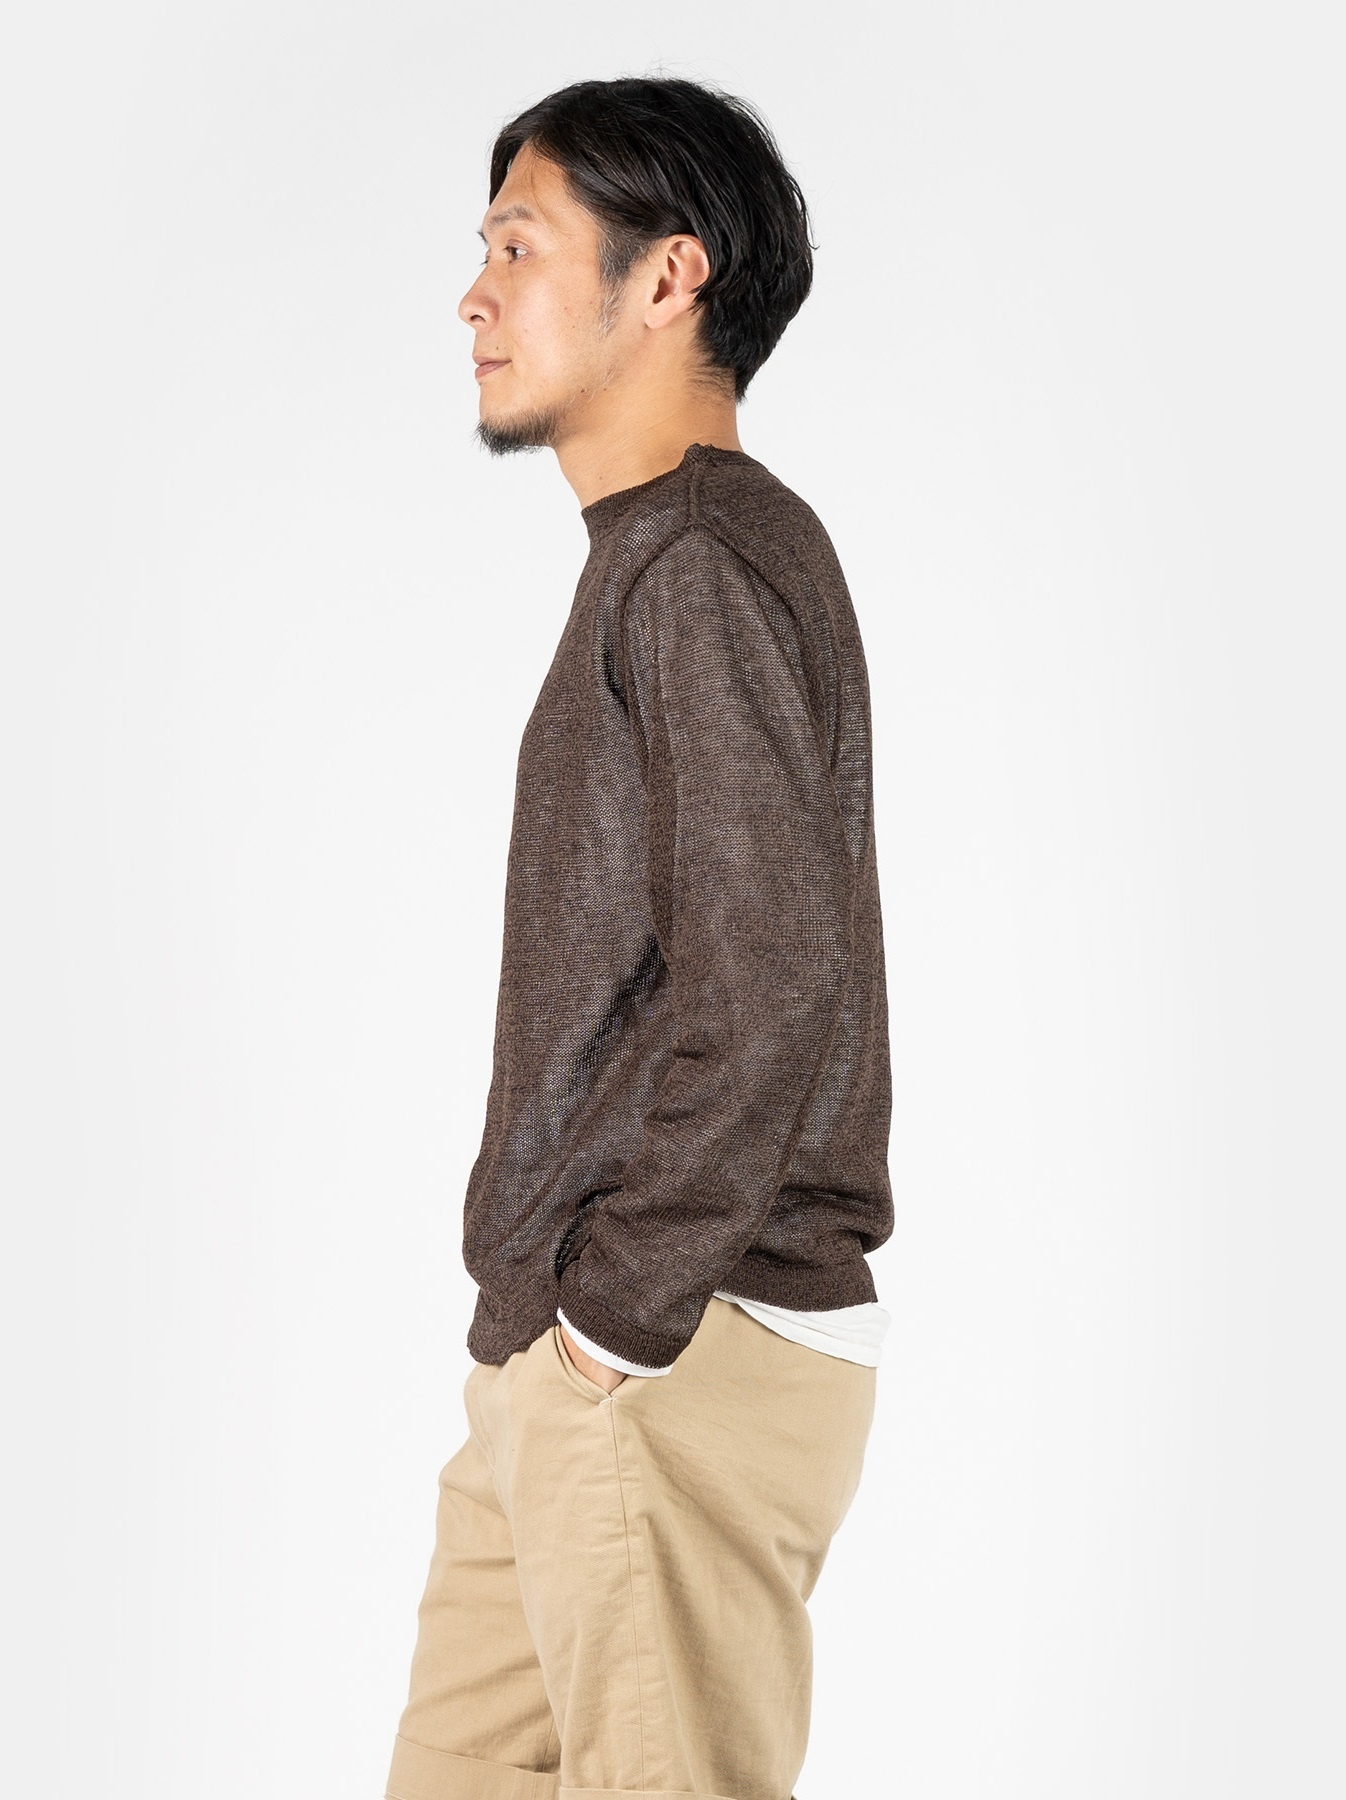 WH Gima Knit Long-sleeved T-shirt-4